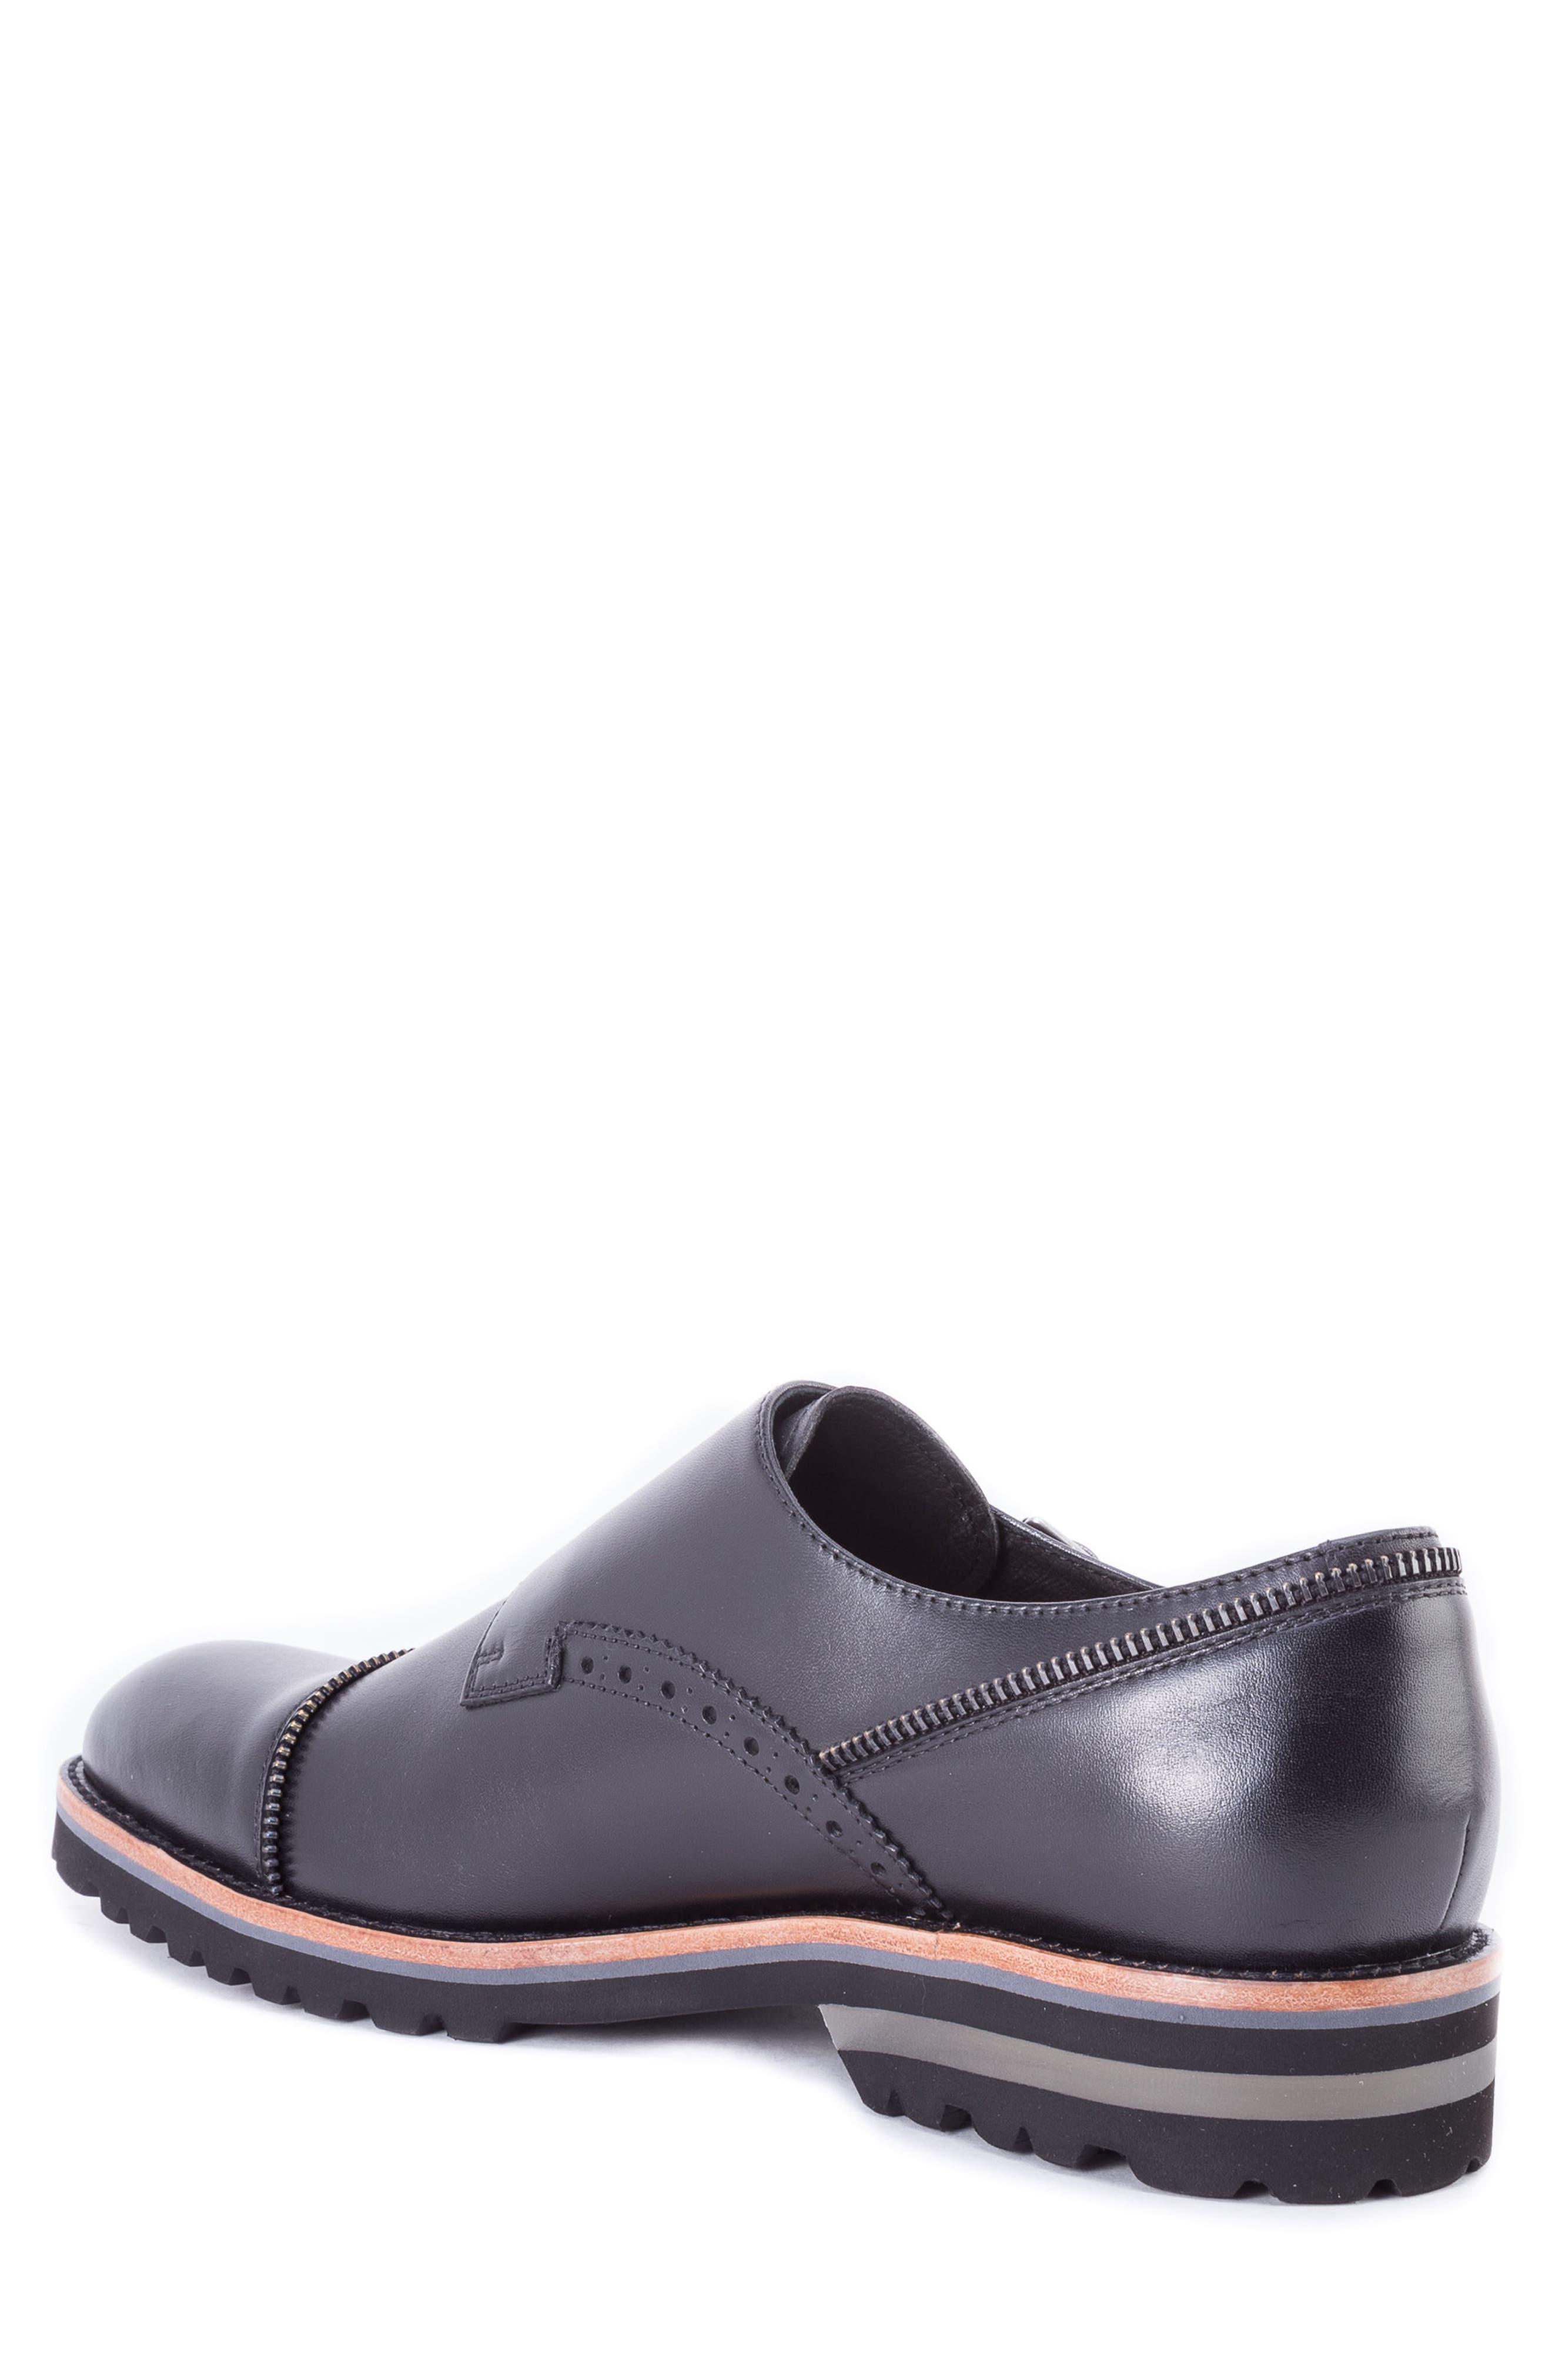 Acadia Double Buckle Monk Shoe,                             Alternate thumbnail 2, color,                             BLACK LEATHER